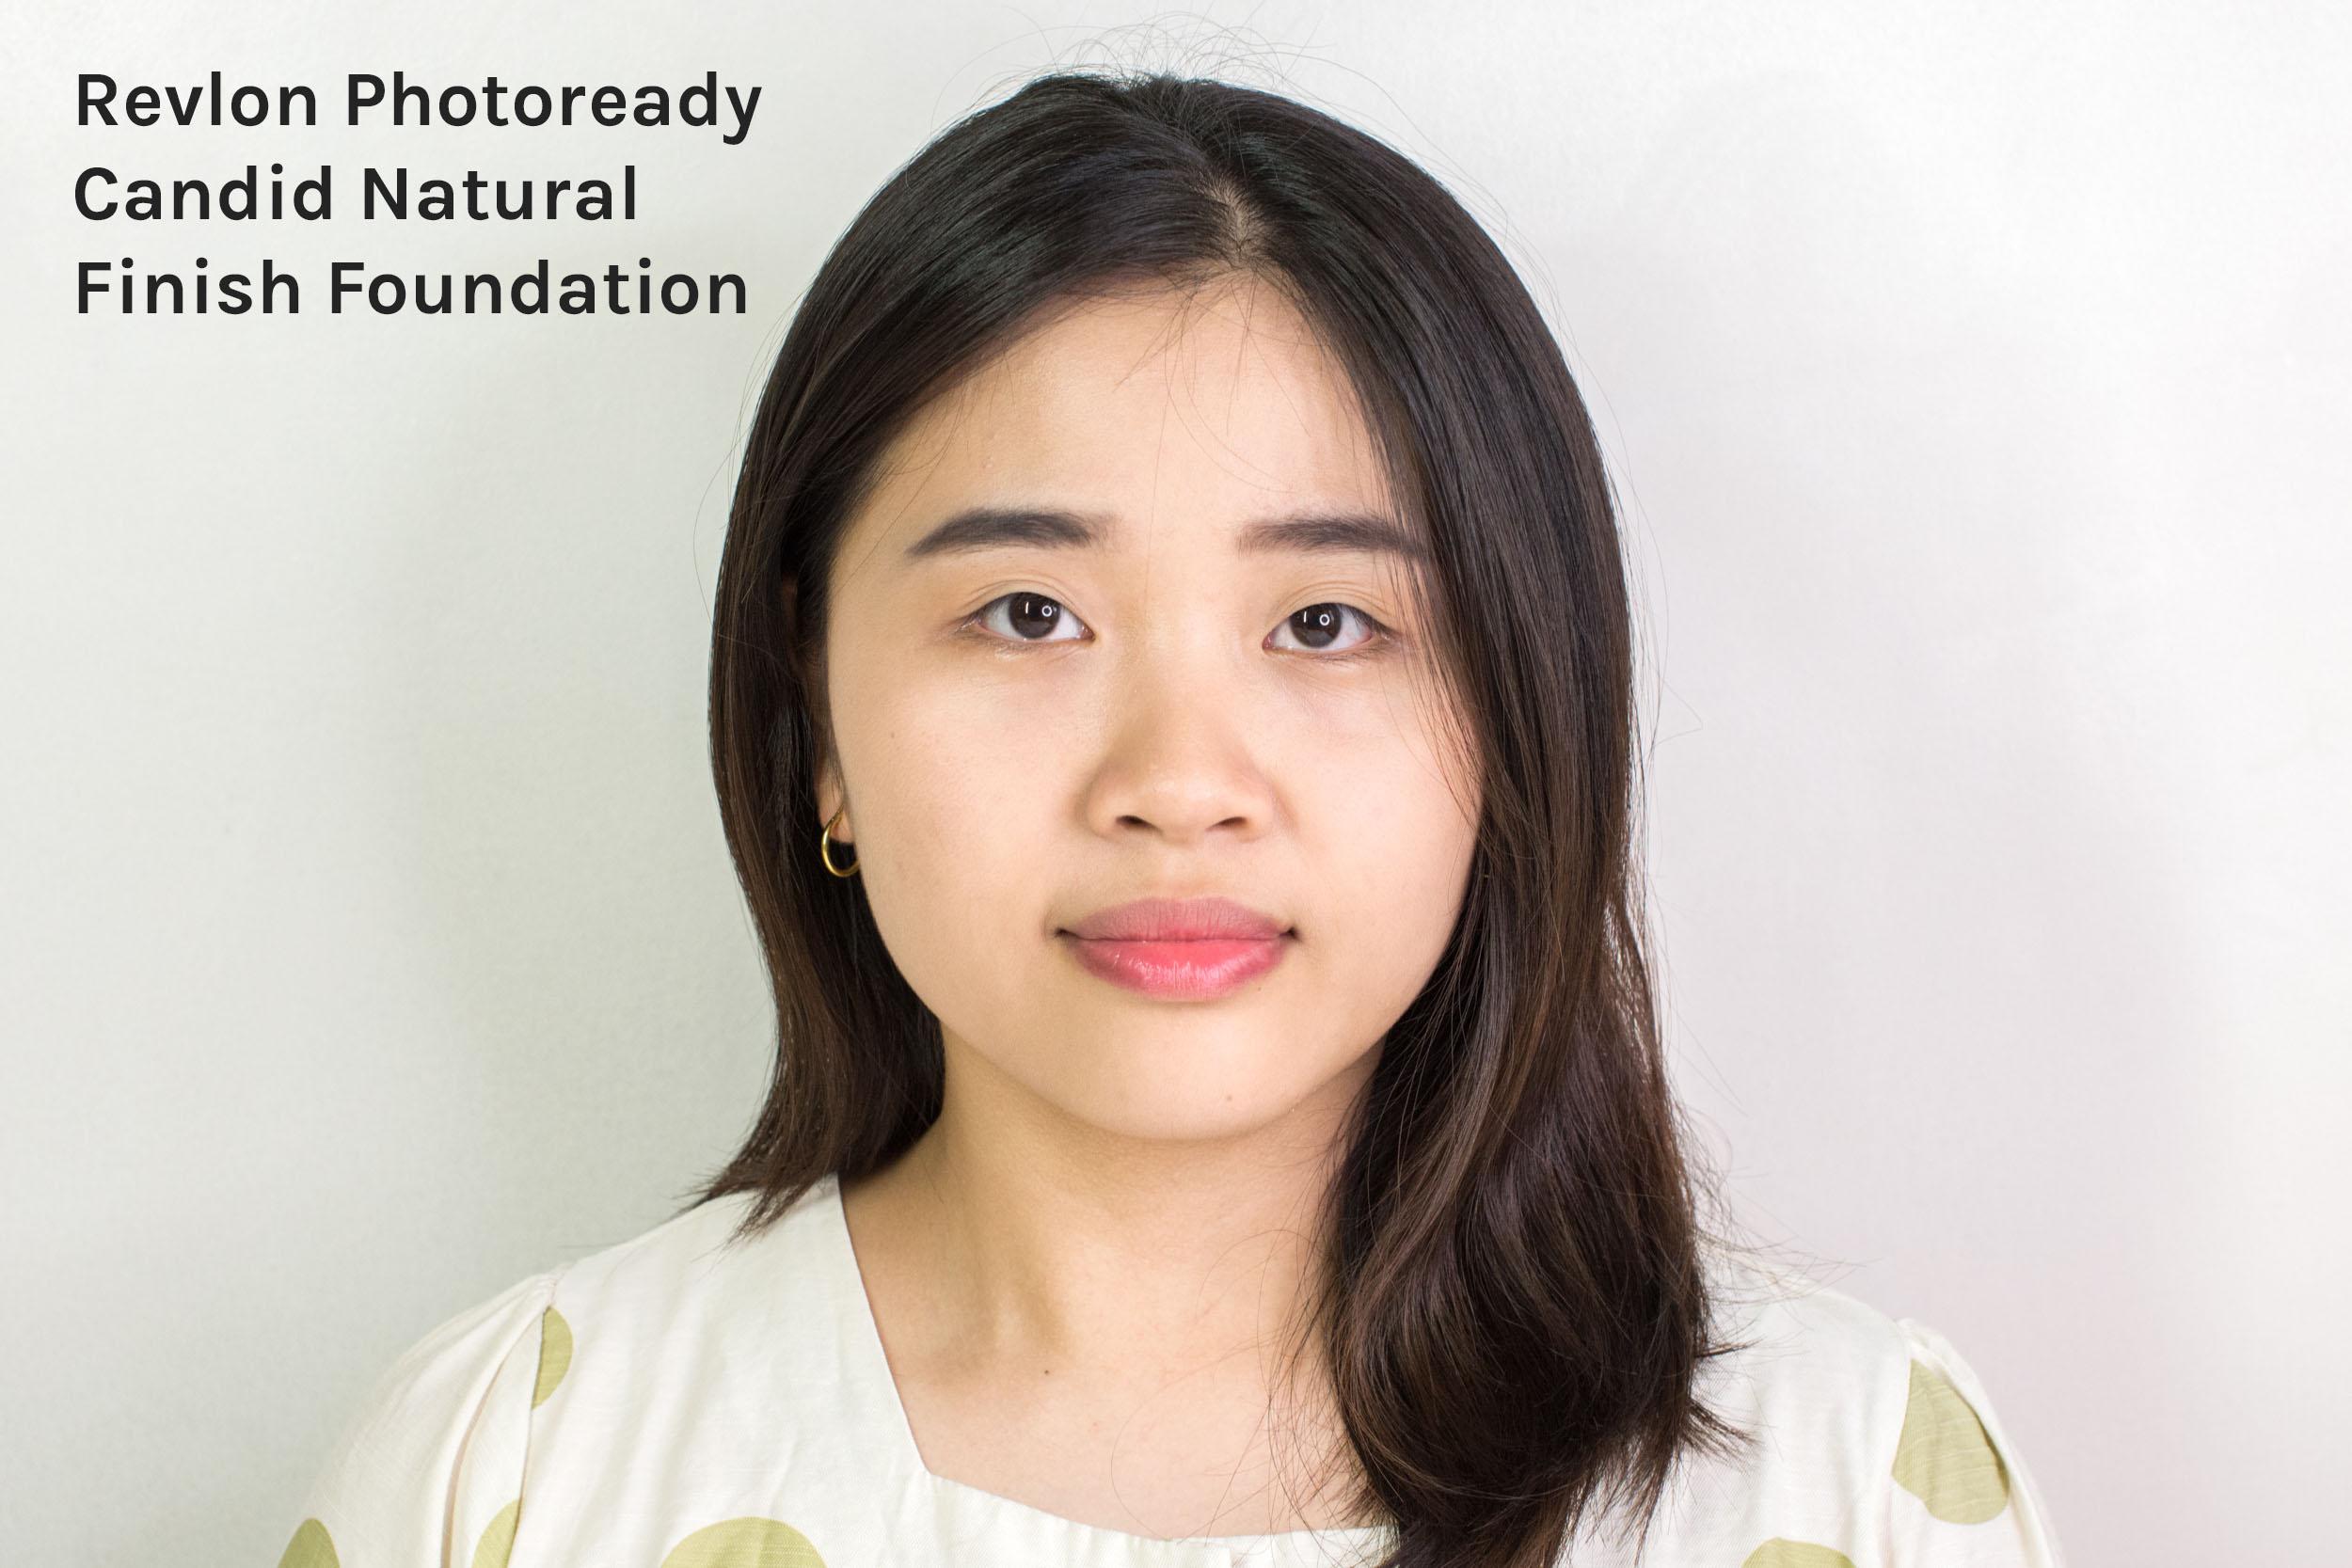 REVLON_lightweight-foundation_face-swatch_review-philippines_2019-3.jpg